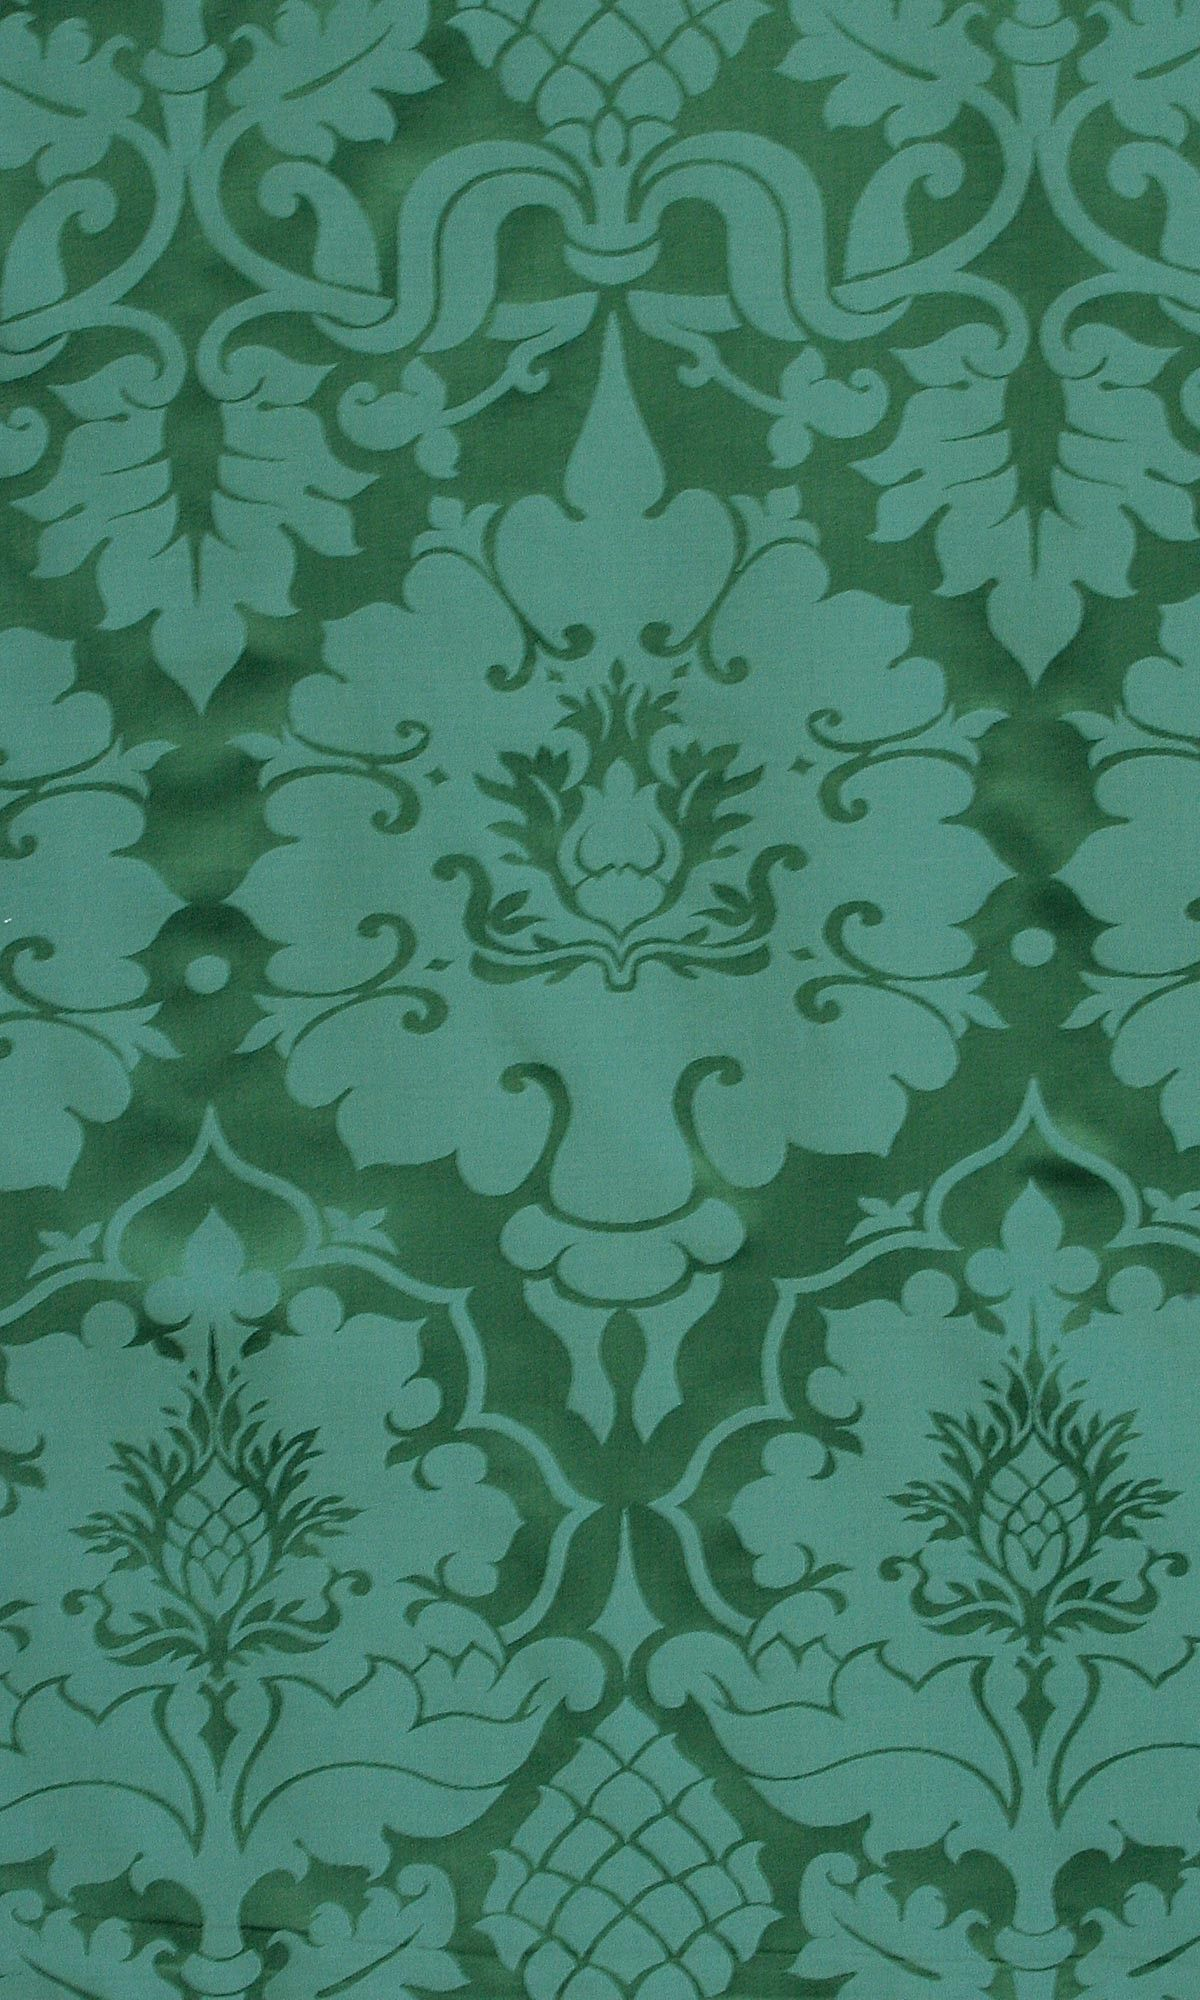 Pattern fabric wallpaper printing on fabric